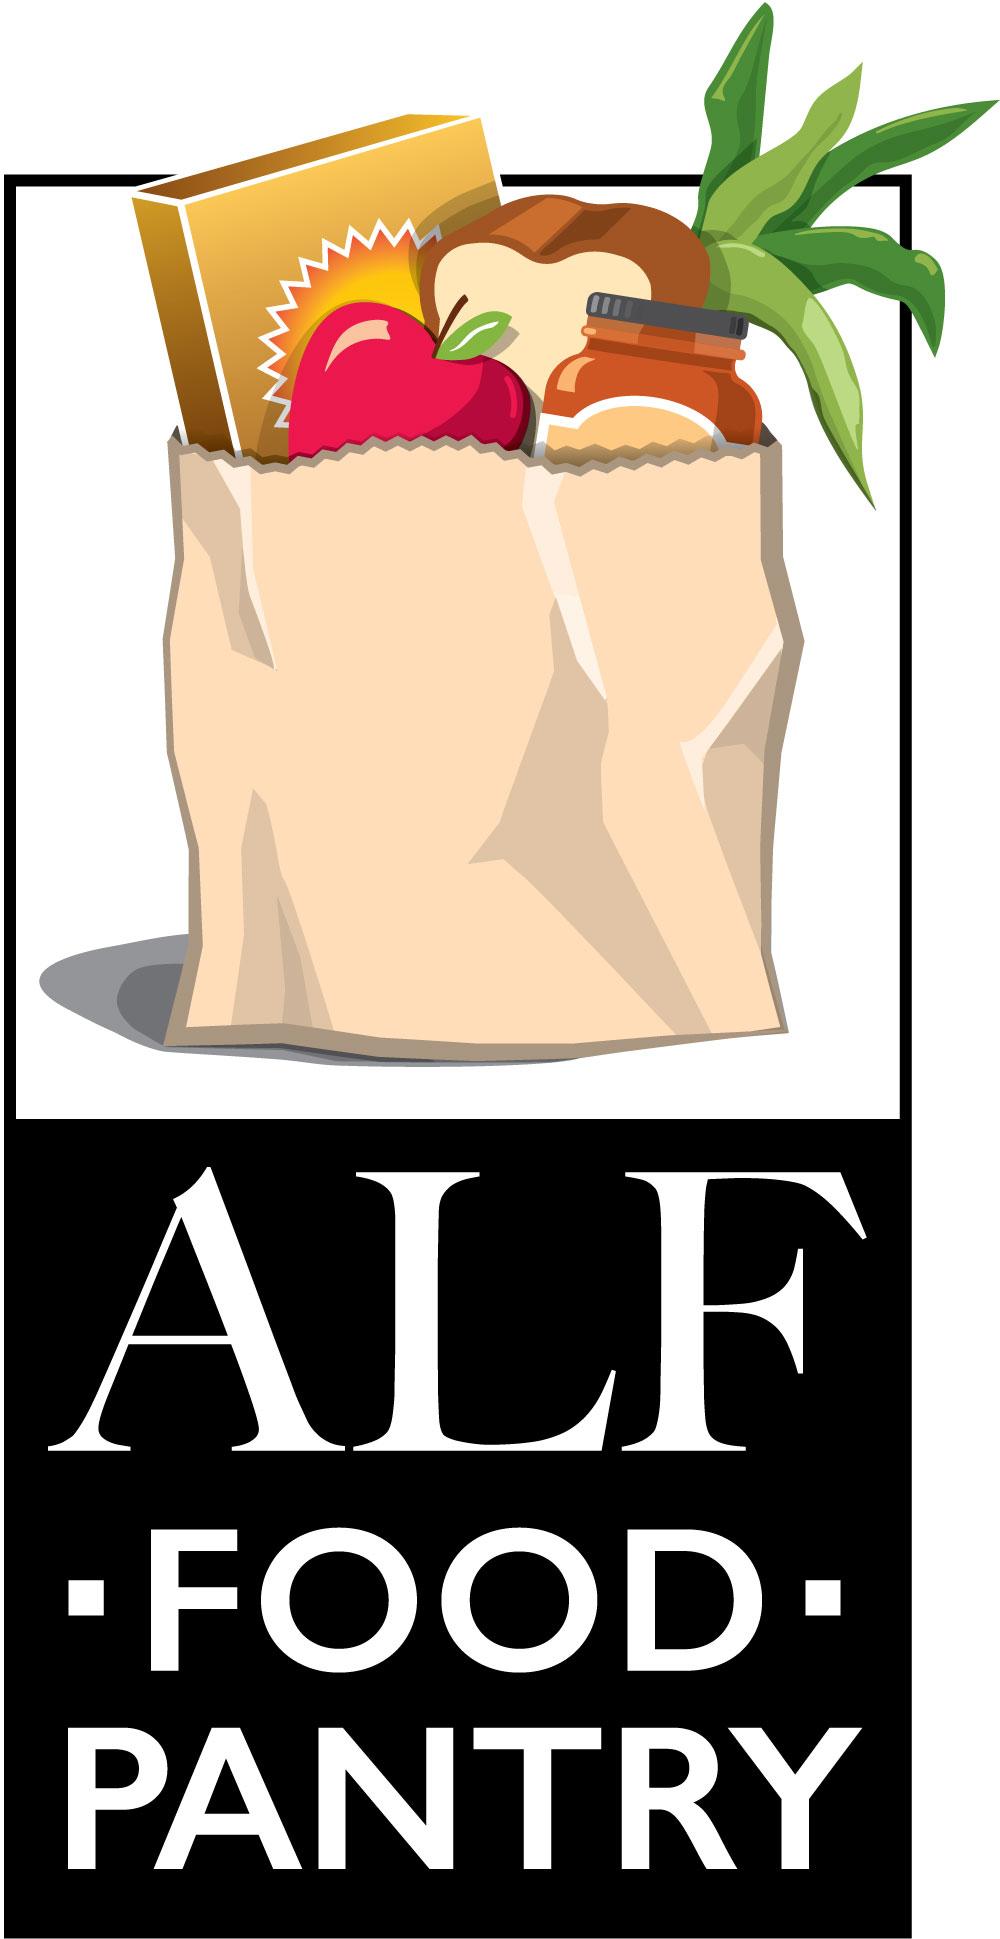 Graphic Design - Logo Design - Atascadero Food Pantry - ALF Food Pantry - Marketing Design - Graphic Designer - Identity Design - Studio 101 West Marketing and Design